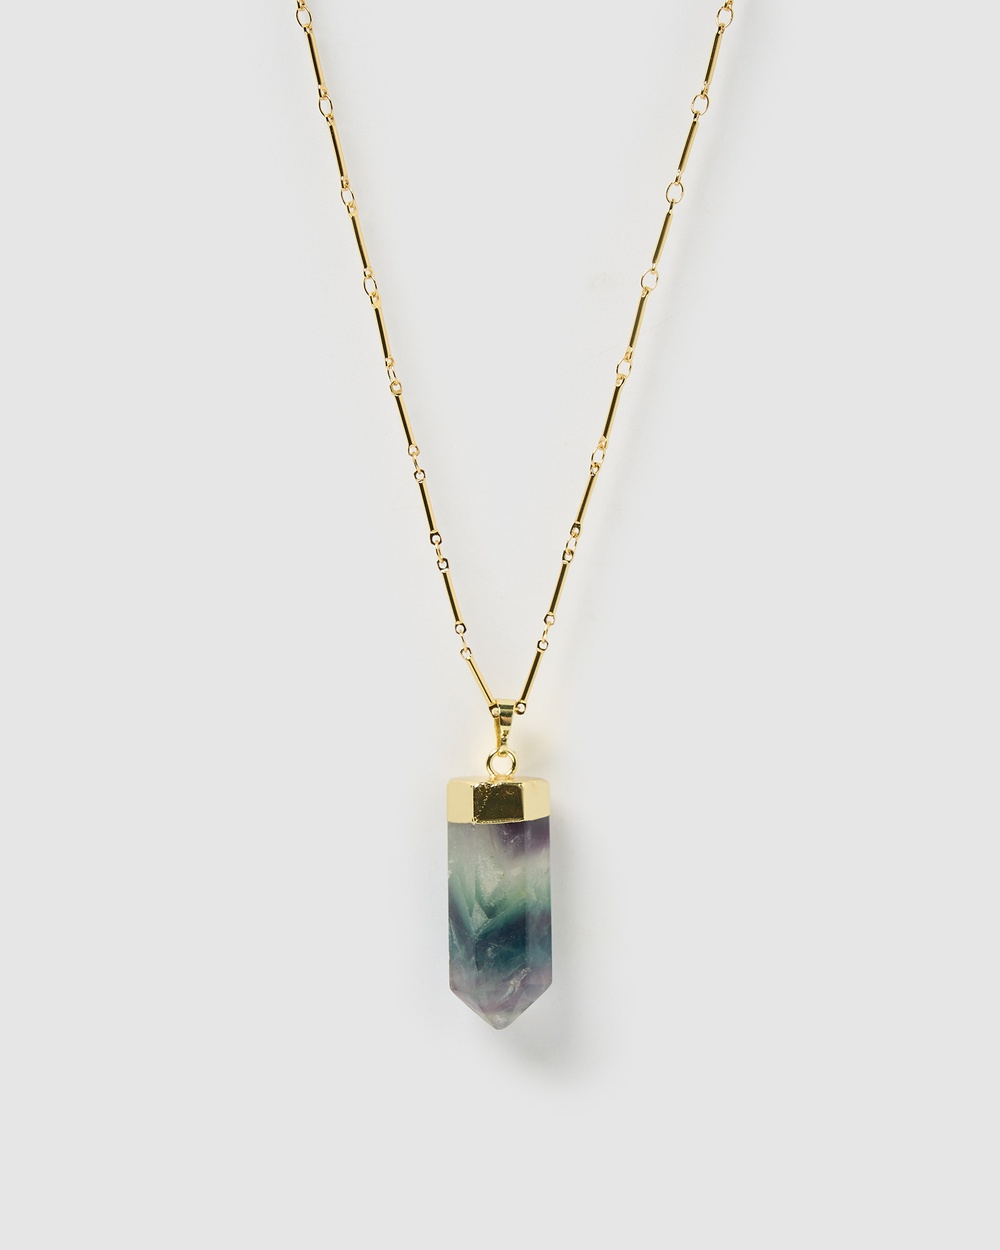 Miz Casa and Co Solitaire Pendant Necklace Jewellery Rainbow Fluorite Gold